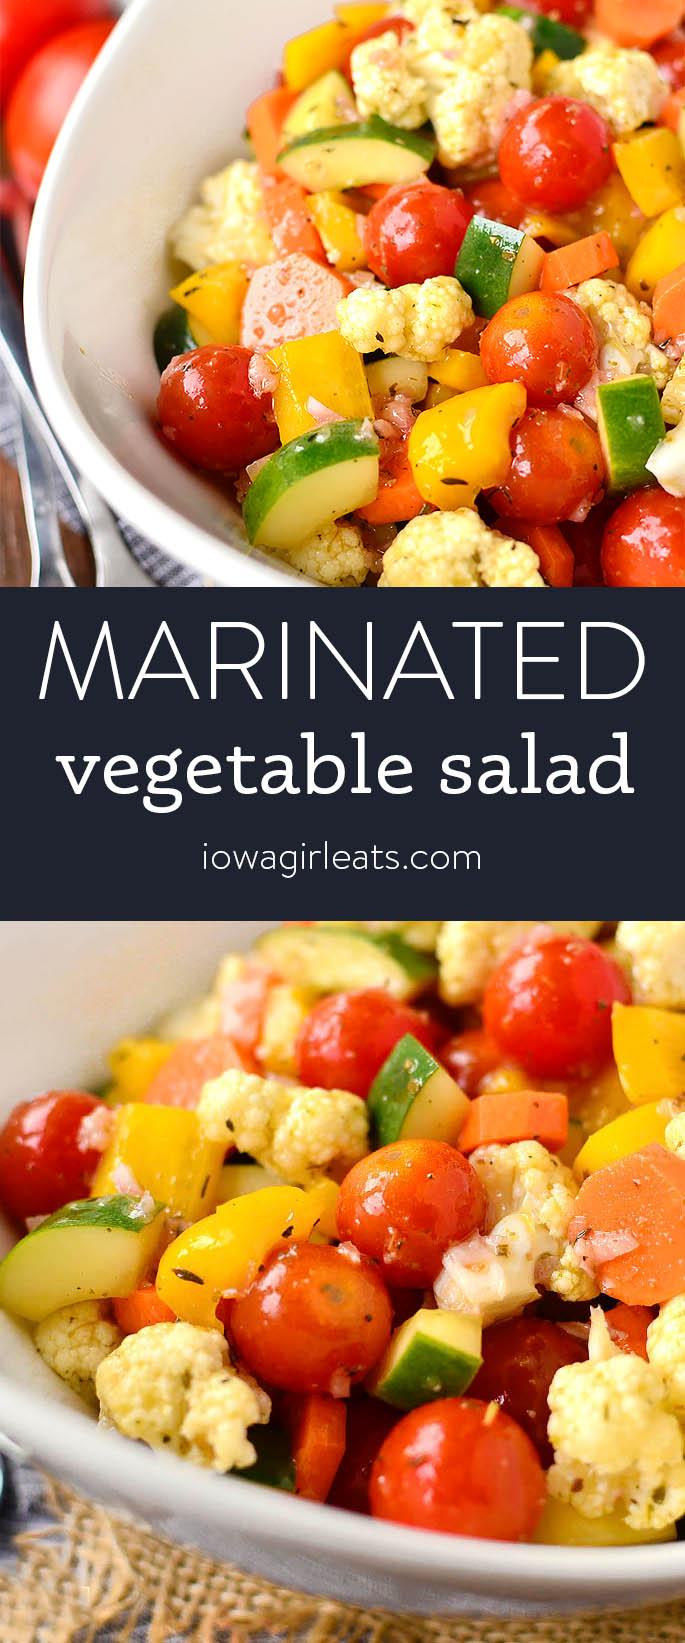 Photo collage of marinated vegetable salad